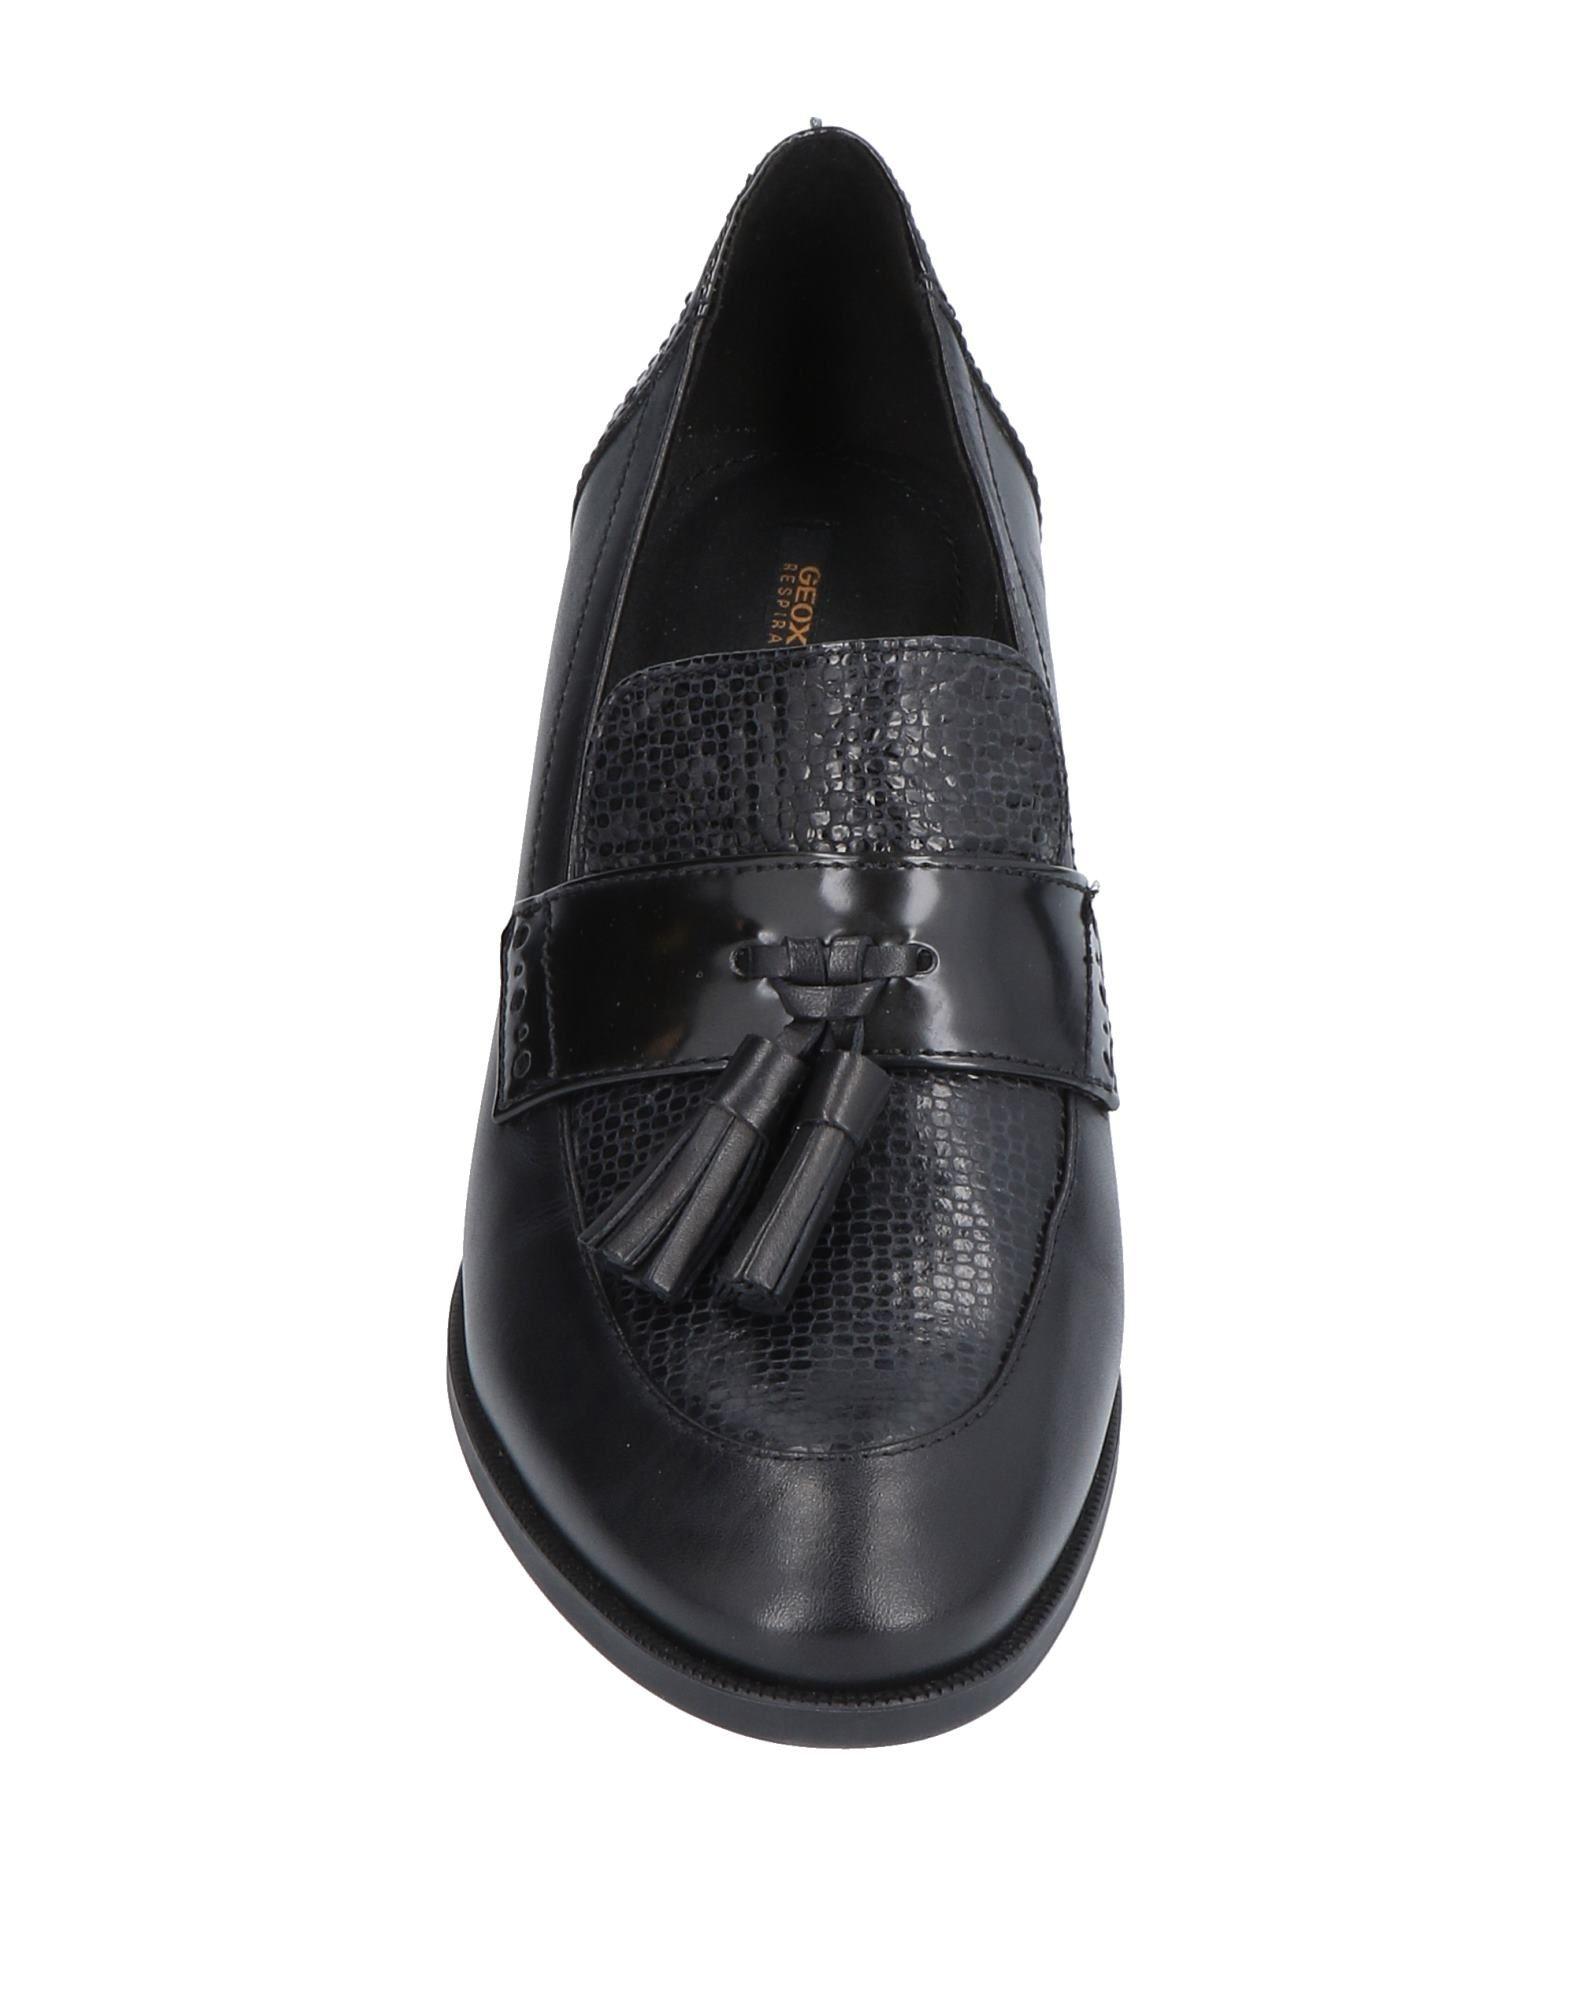 Geox  Mokassins Damen  Geox 11499865NO Gute Qualität beliebte Schuhe 805276